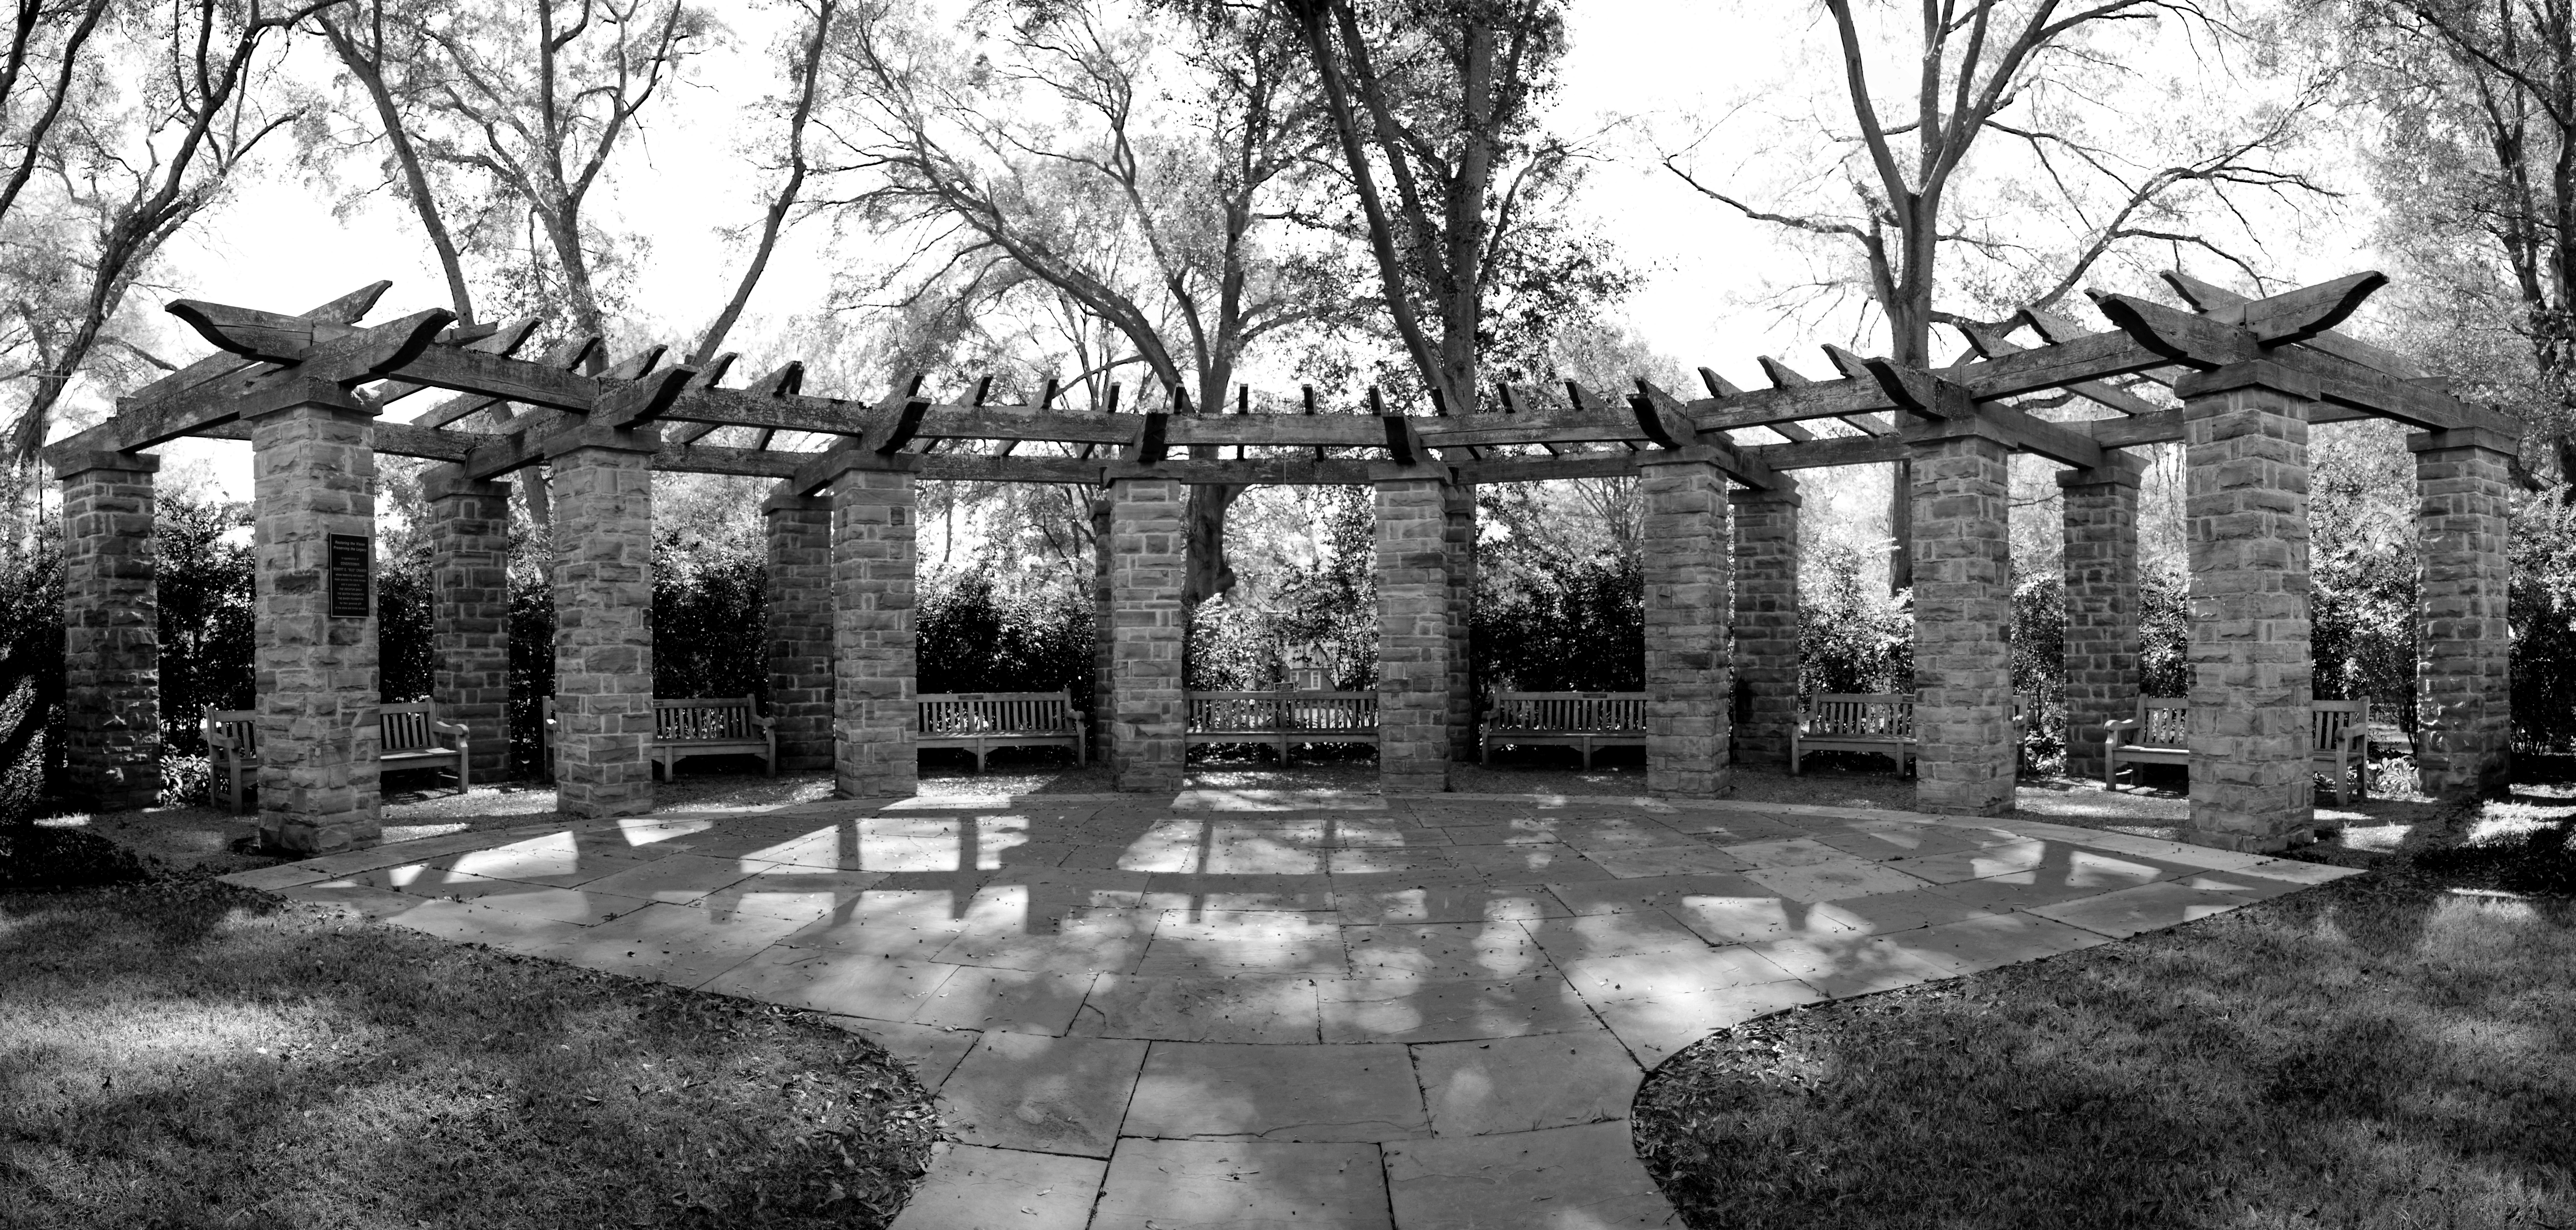 фото черно белые двор византийского замка